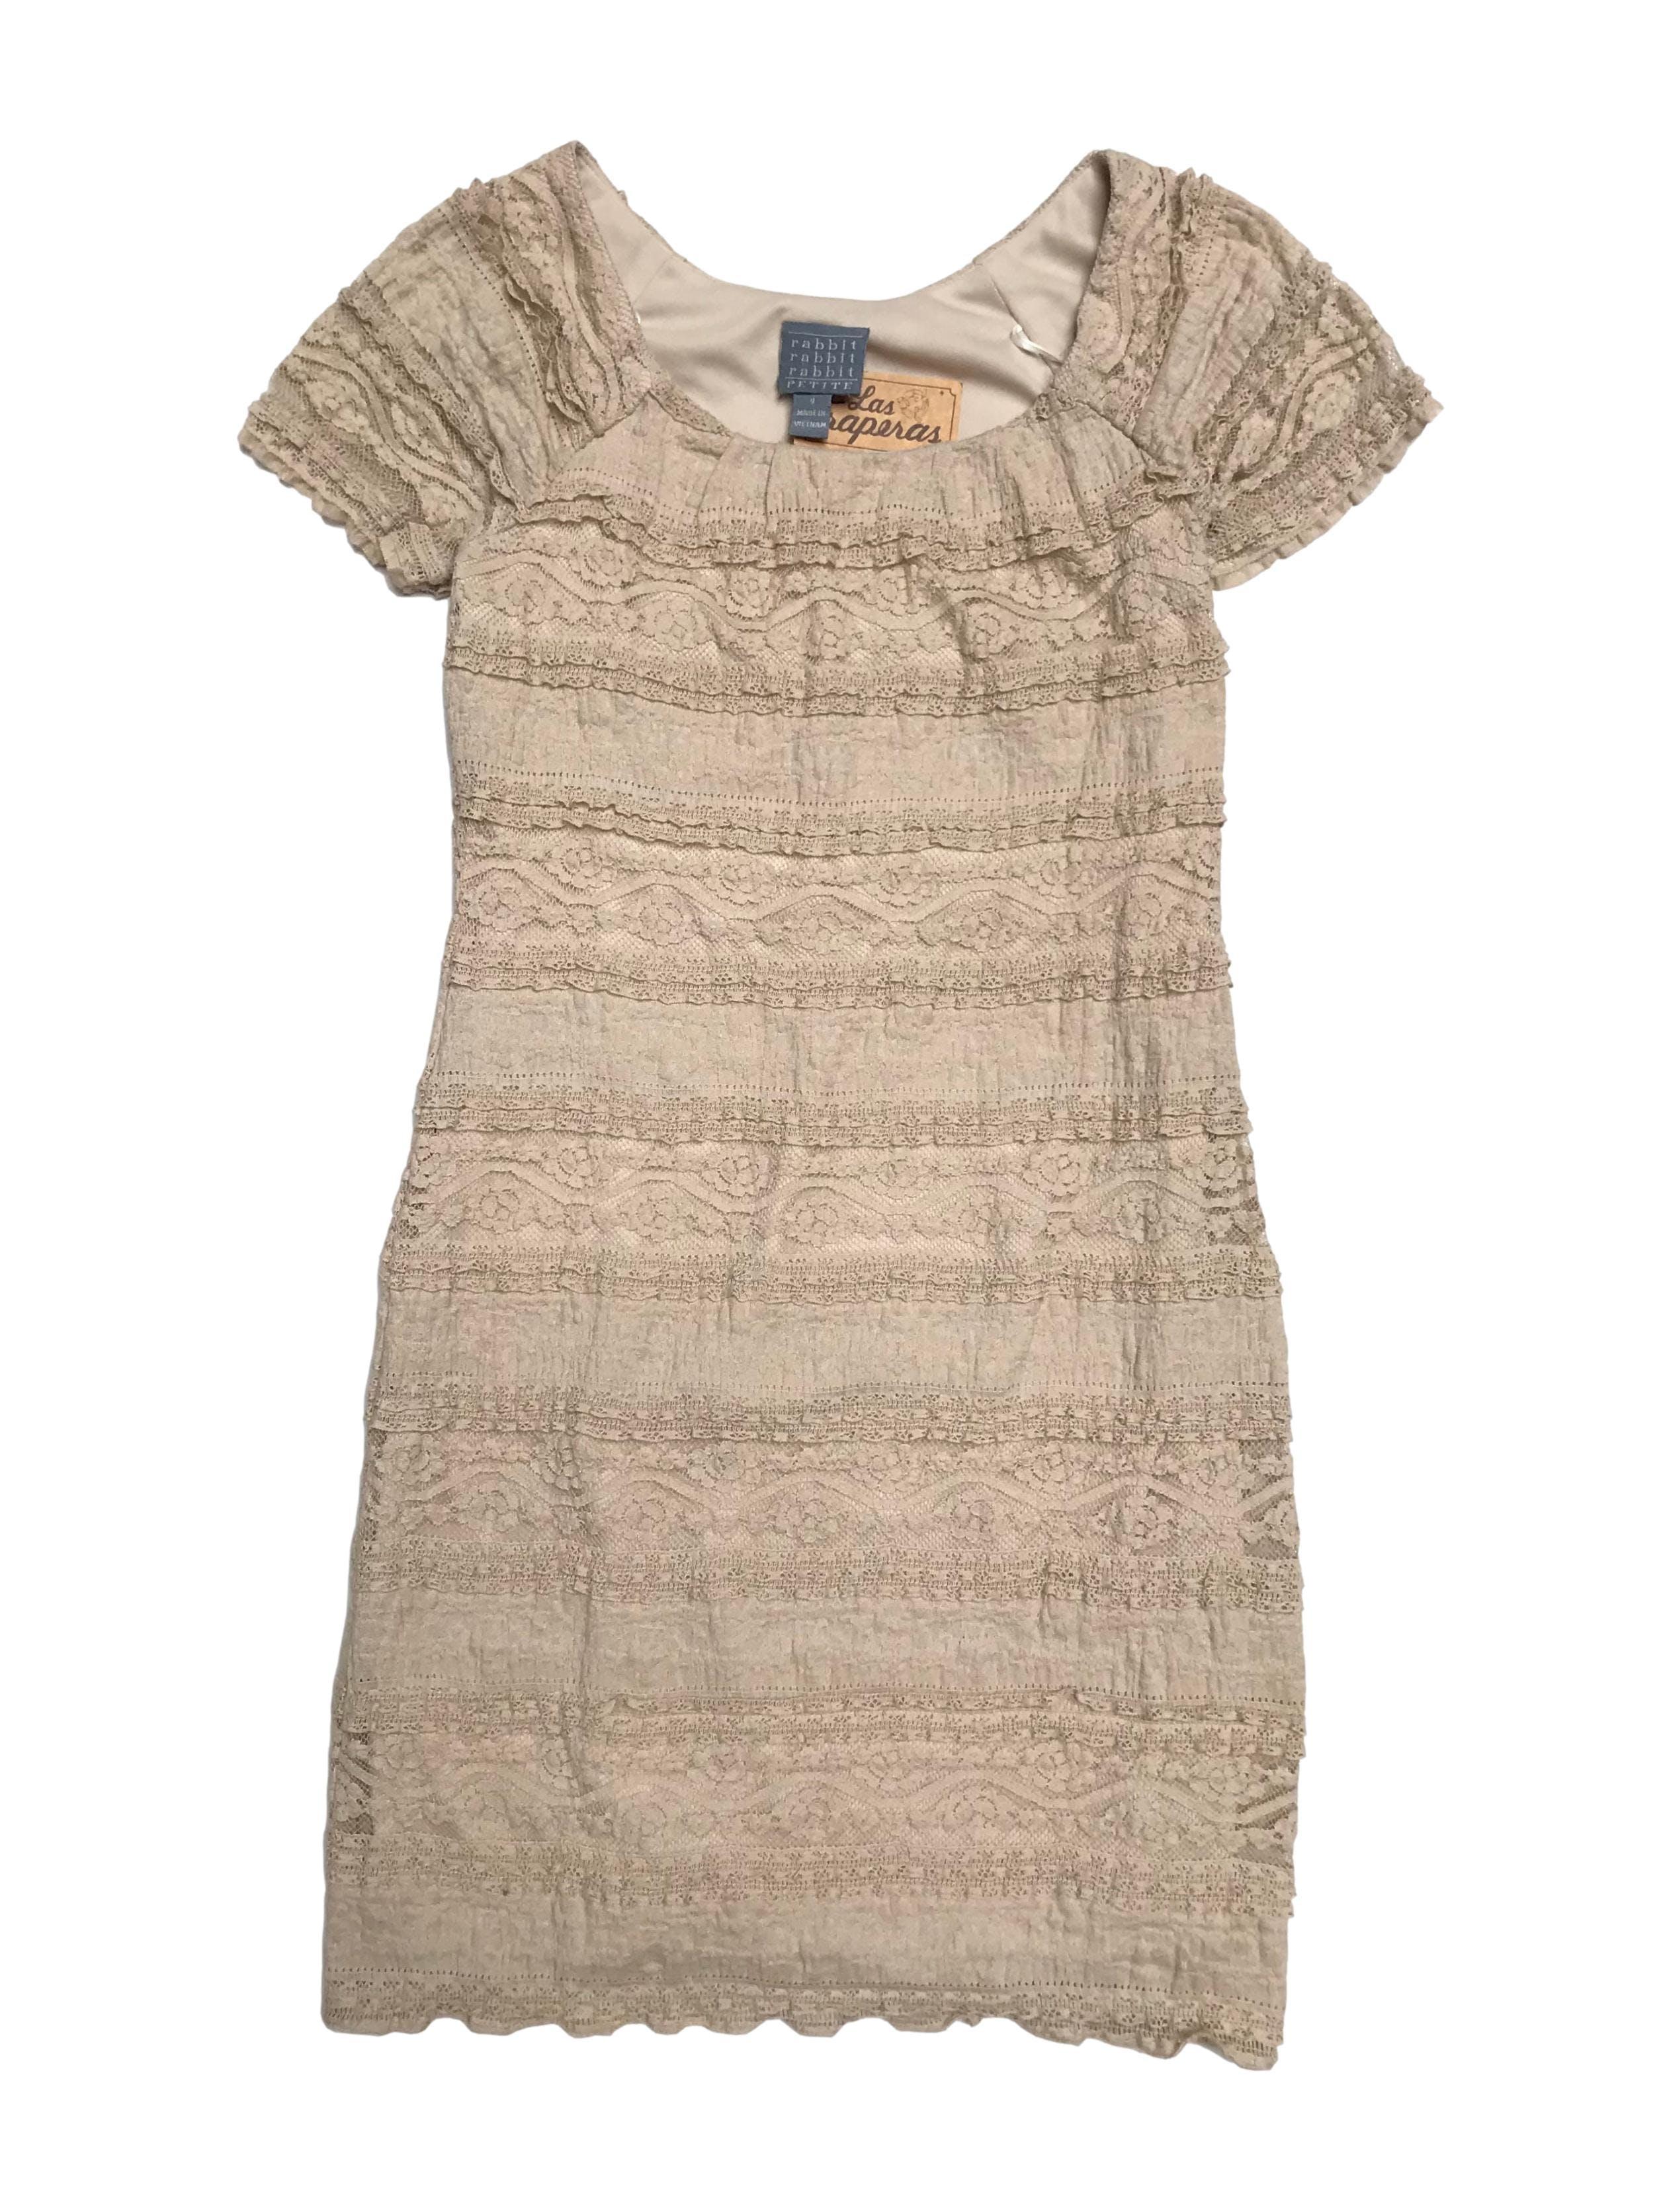 Vestido Rabbit de encaje beige suavecito con forro. Largo 88cm